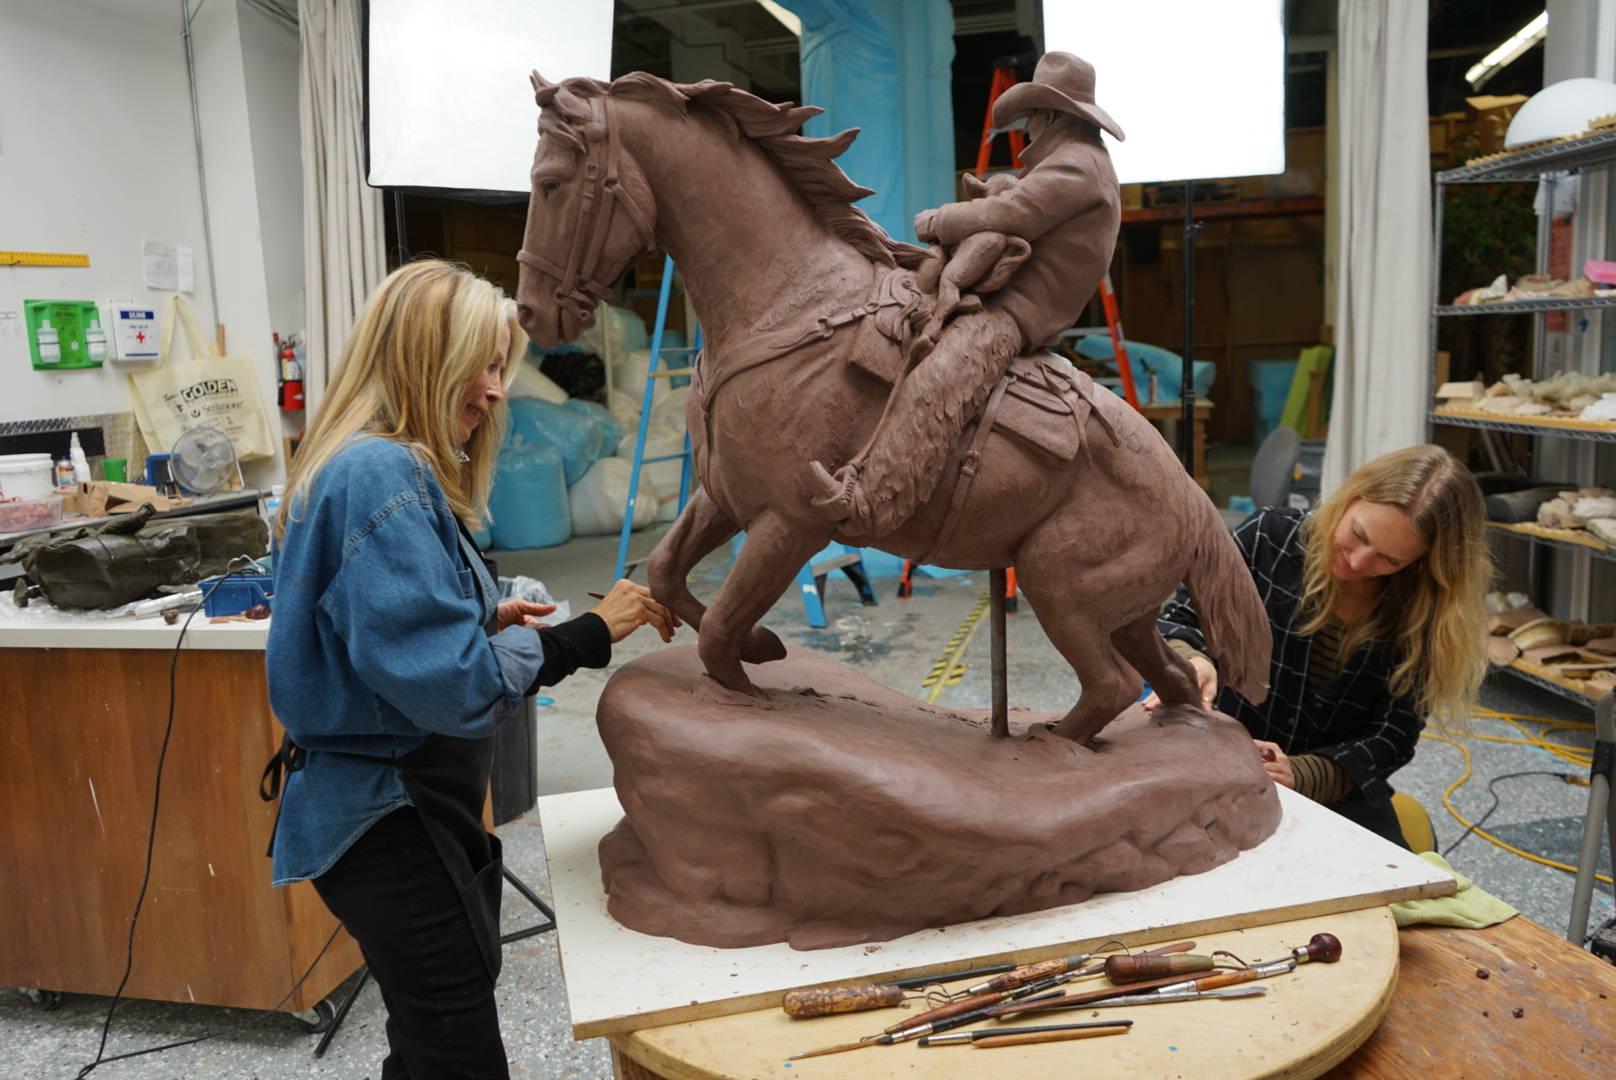 Star Liana York Sculpture Workshop. Sorrel Sky Gallery. Artist Workshops. Artist Workshop. Sorrel Sky Workshop. Santa Fe Art Gallery. Santa Fe Workshop. Durango Workshop.